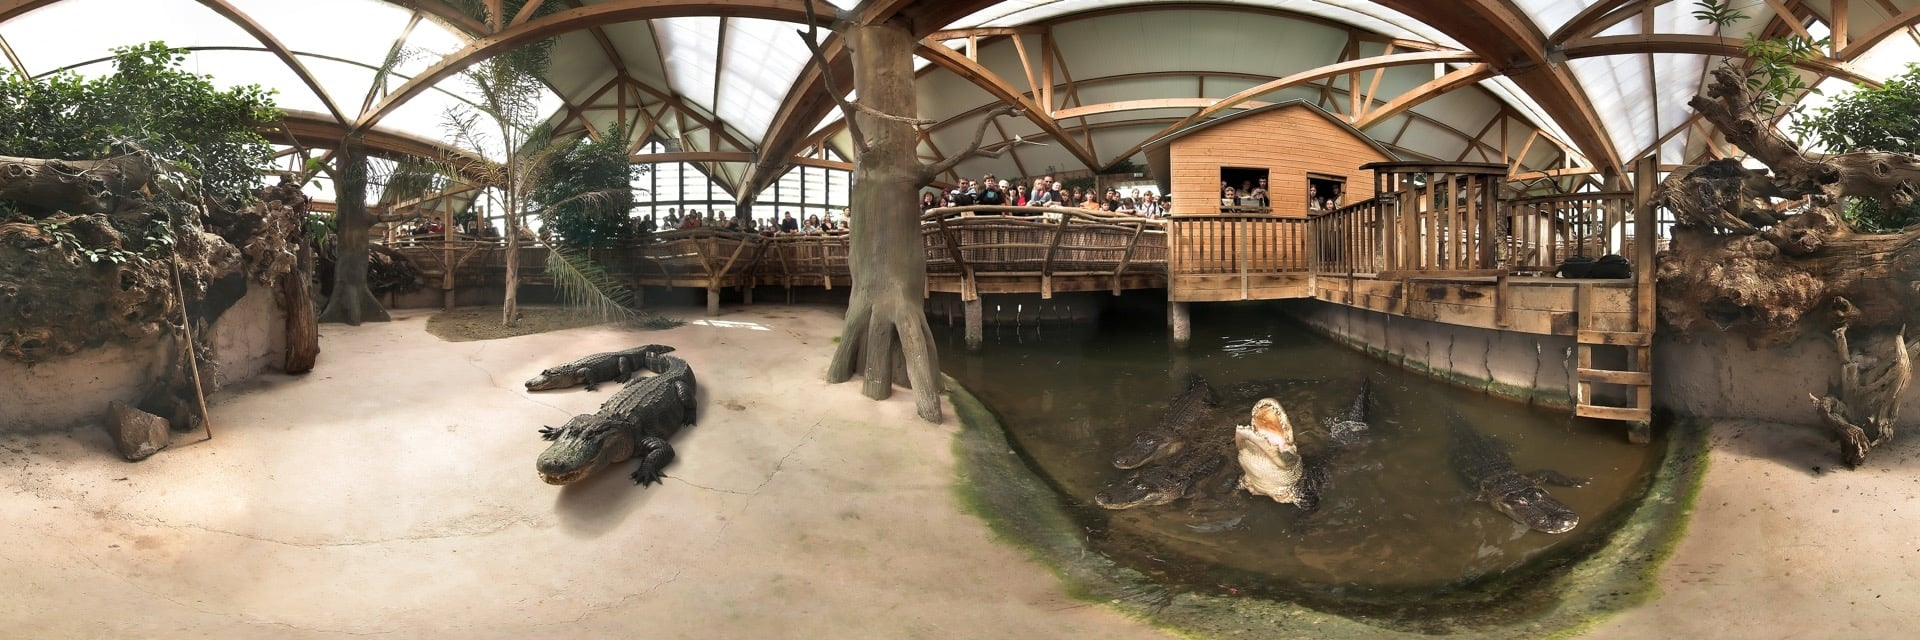 La serre aux aligators - panorama